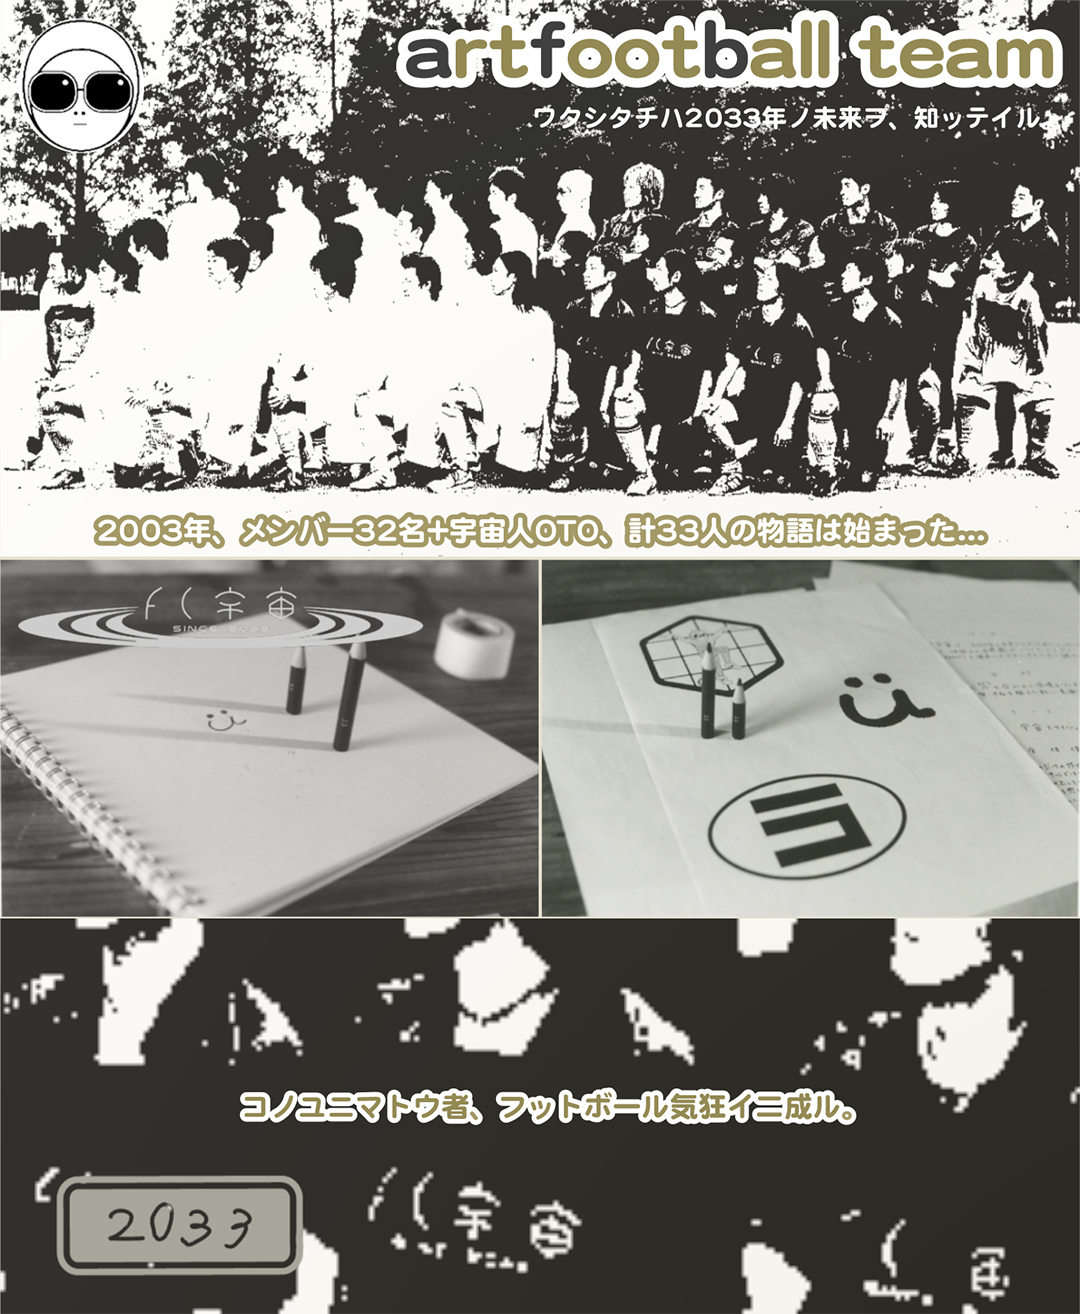 artfootball team-ワタシタチハ2033年ノ未来ヲ、知ッテイル|2003年、メンバー32名+宇宙人OTO、計33人の物語は始まった…|コノユニマトウ者、フットボール気狂イ(キチガイ)二成ル。